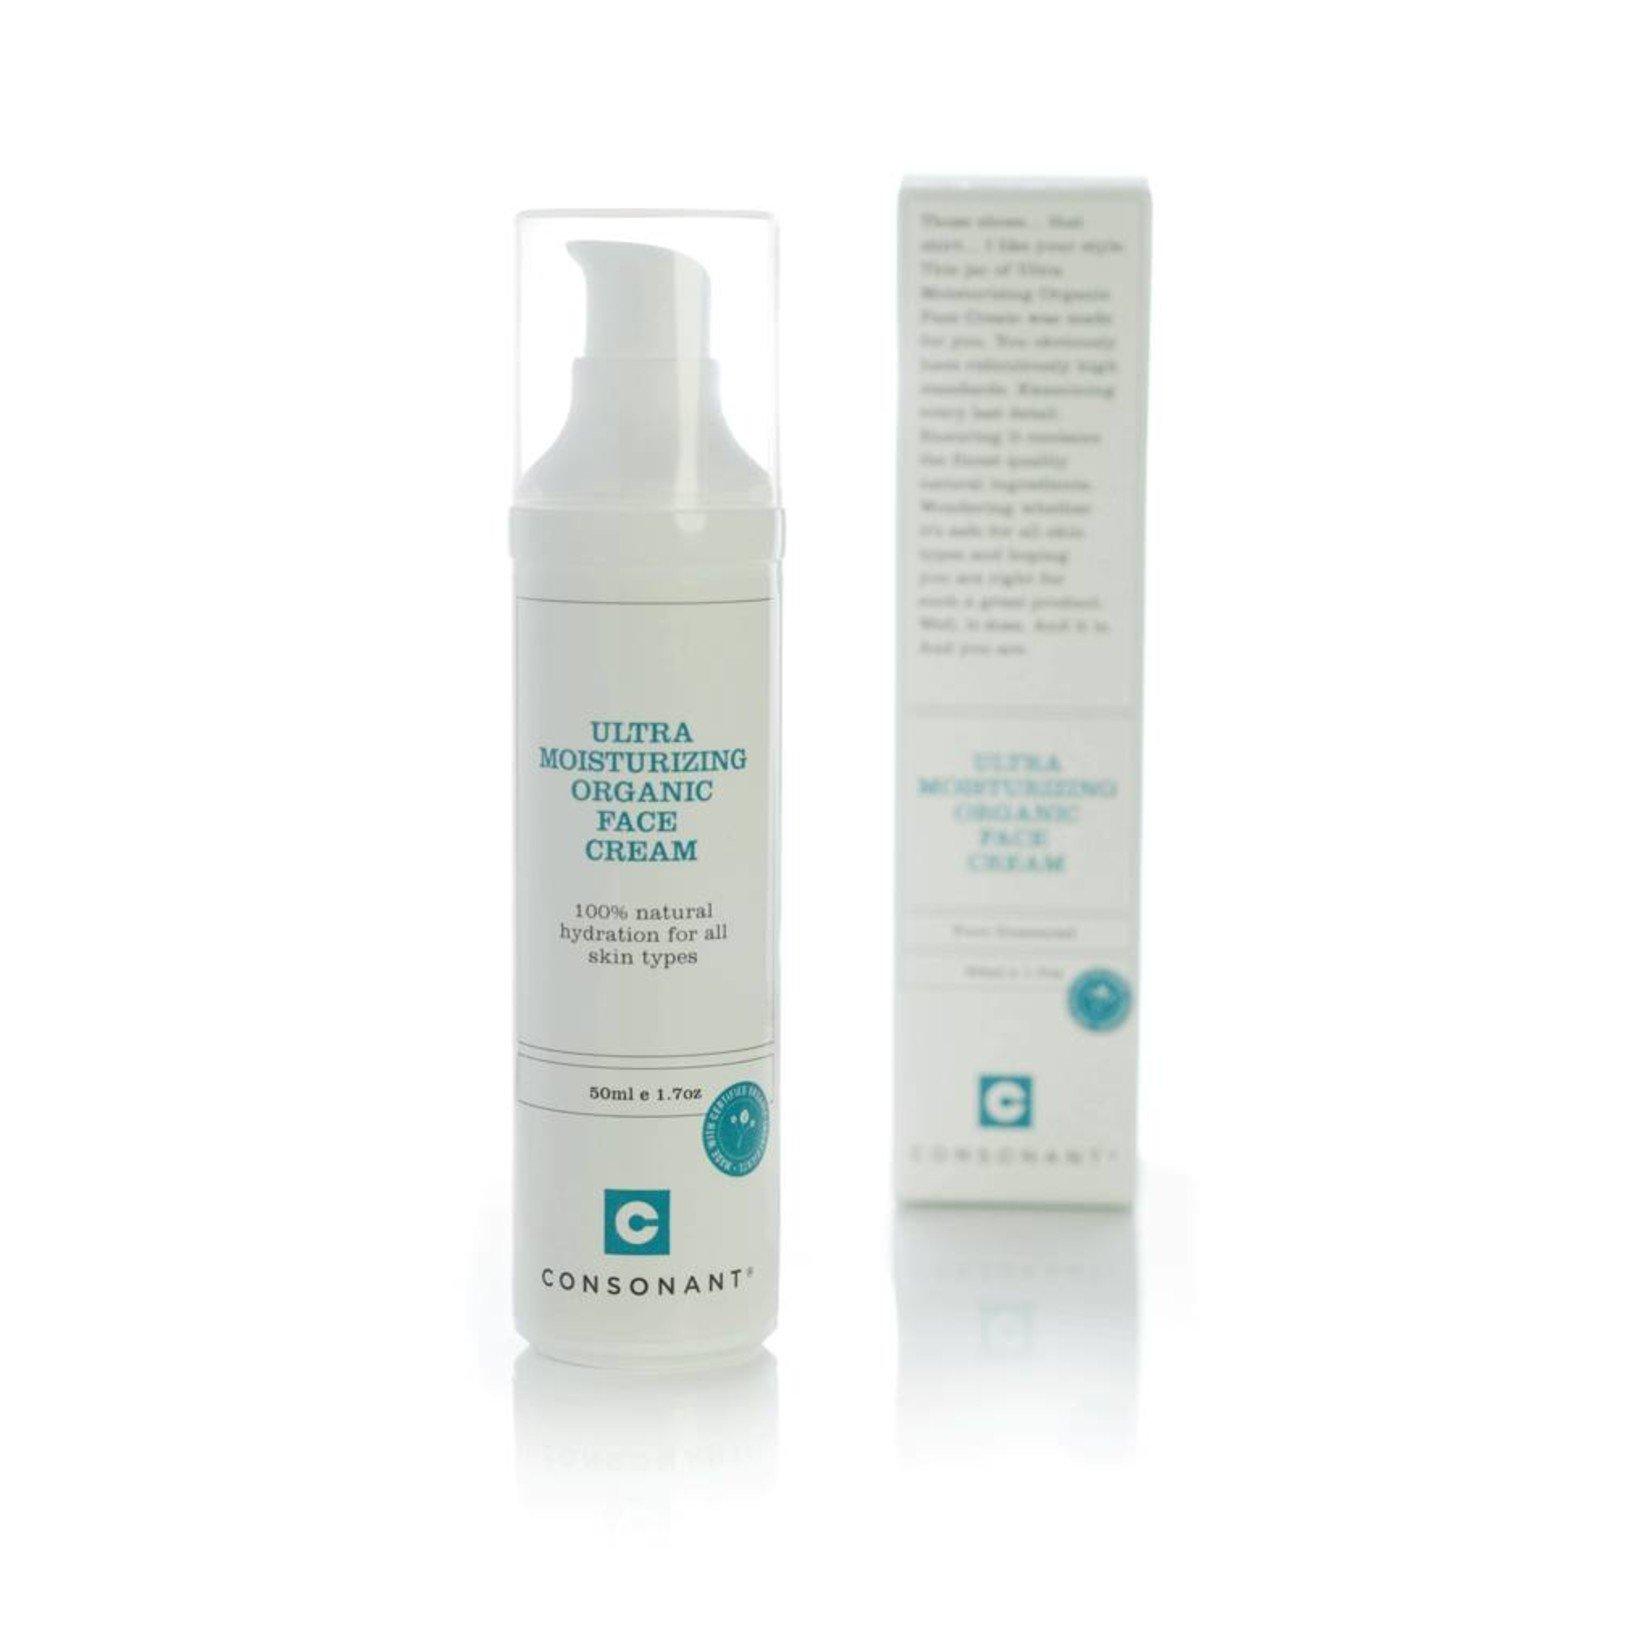 Consonant Skin Care Ultra Moisturizing Organic Face Cream 50ml